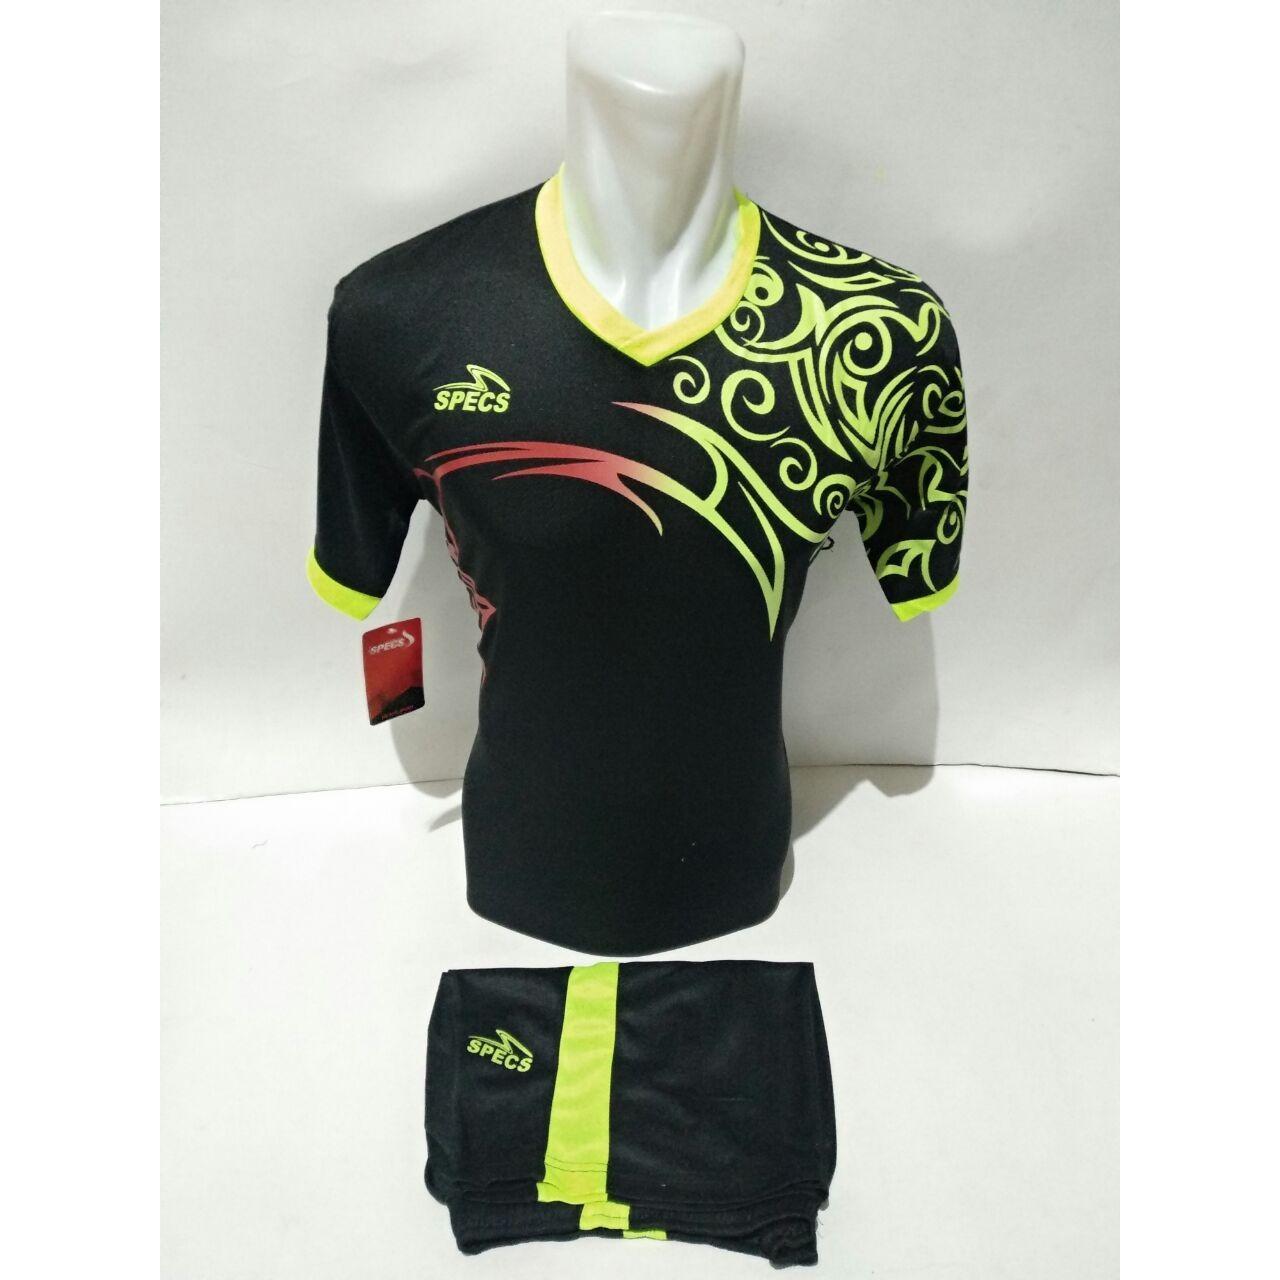 [Terbaru SPC 05] Baju Kaos Olahraga Setelan Tim Futsal/Volly